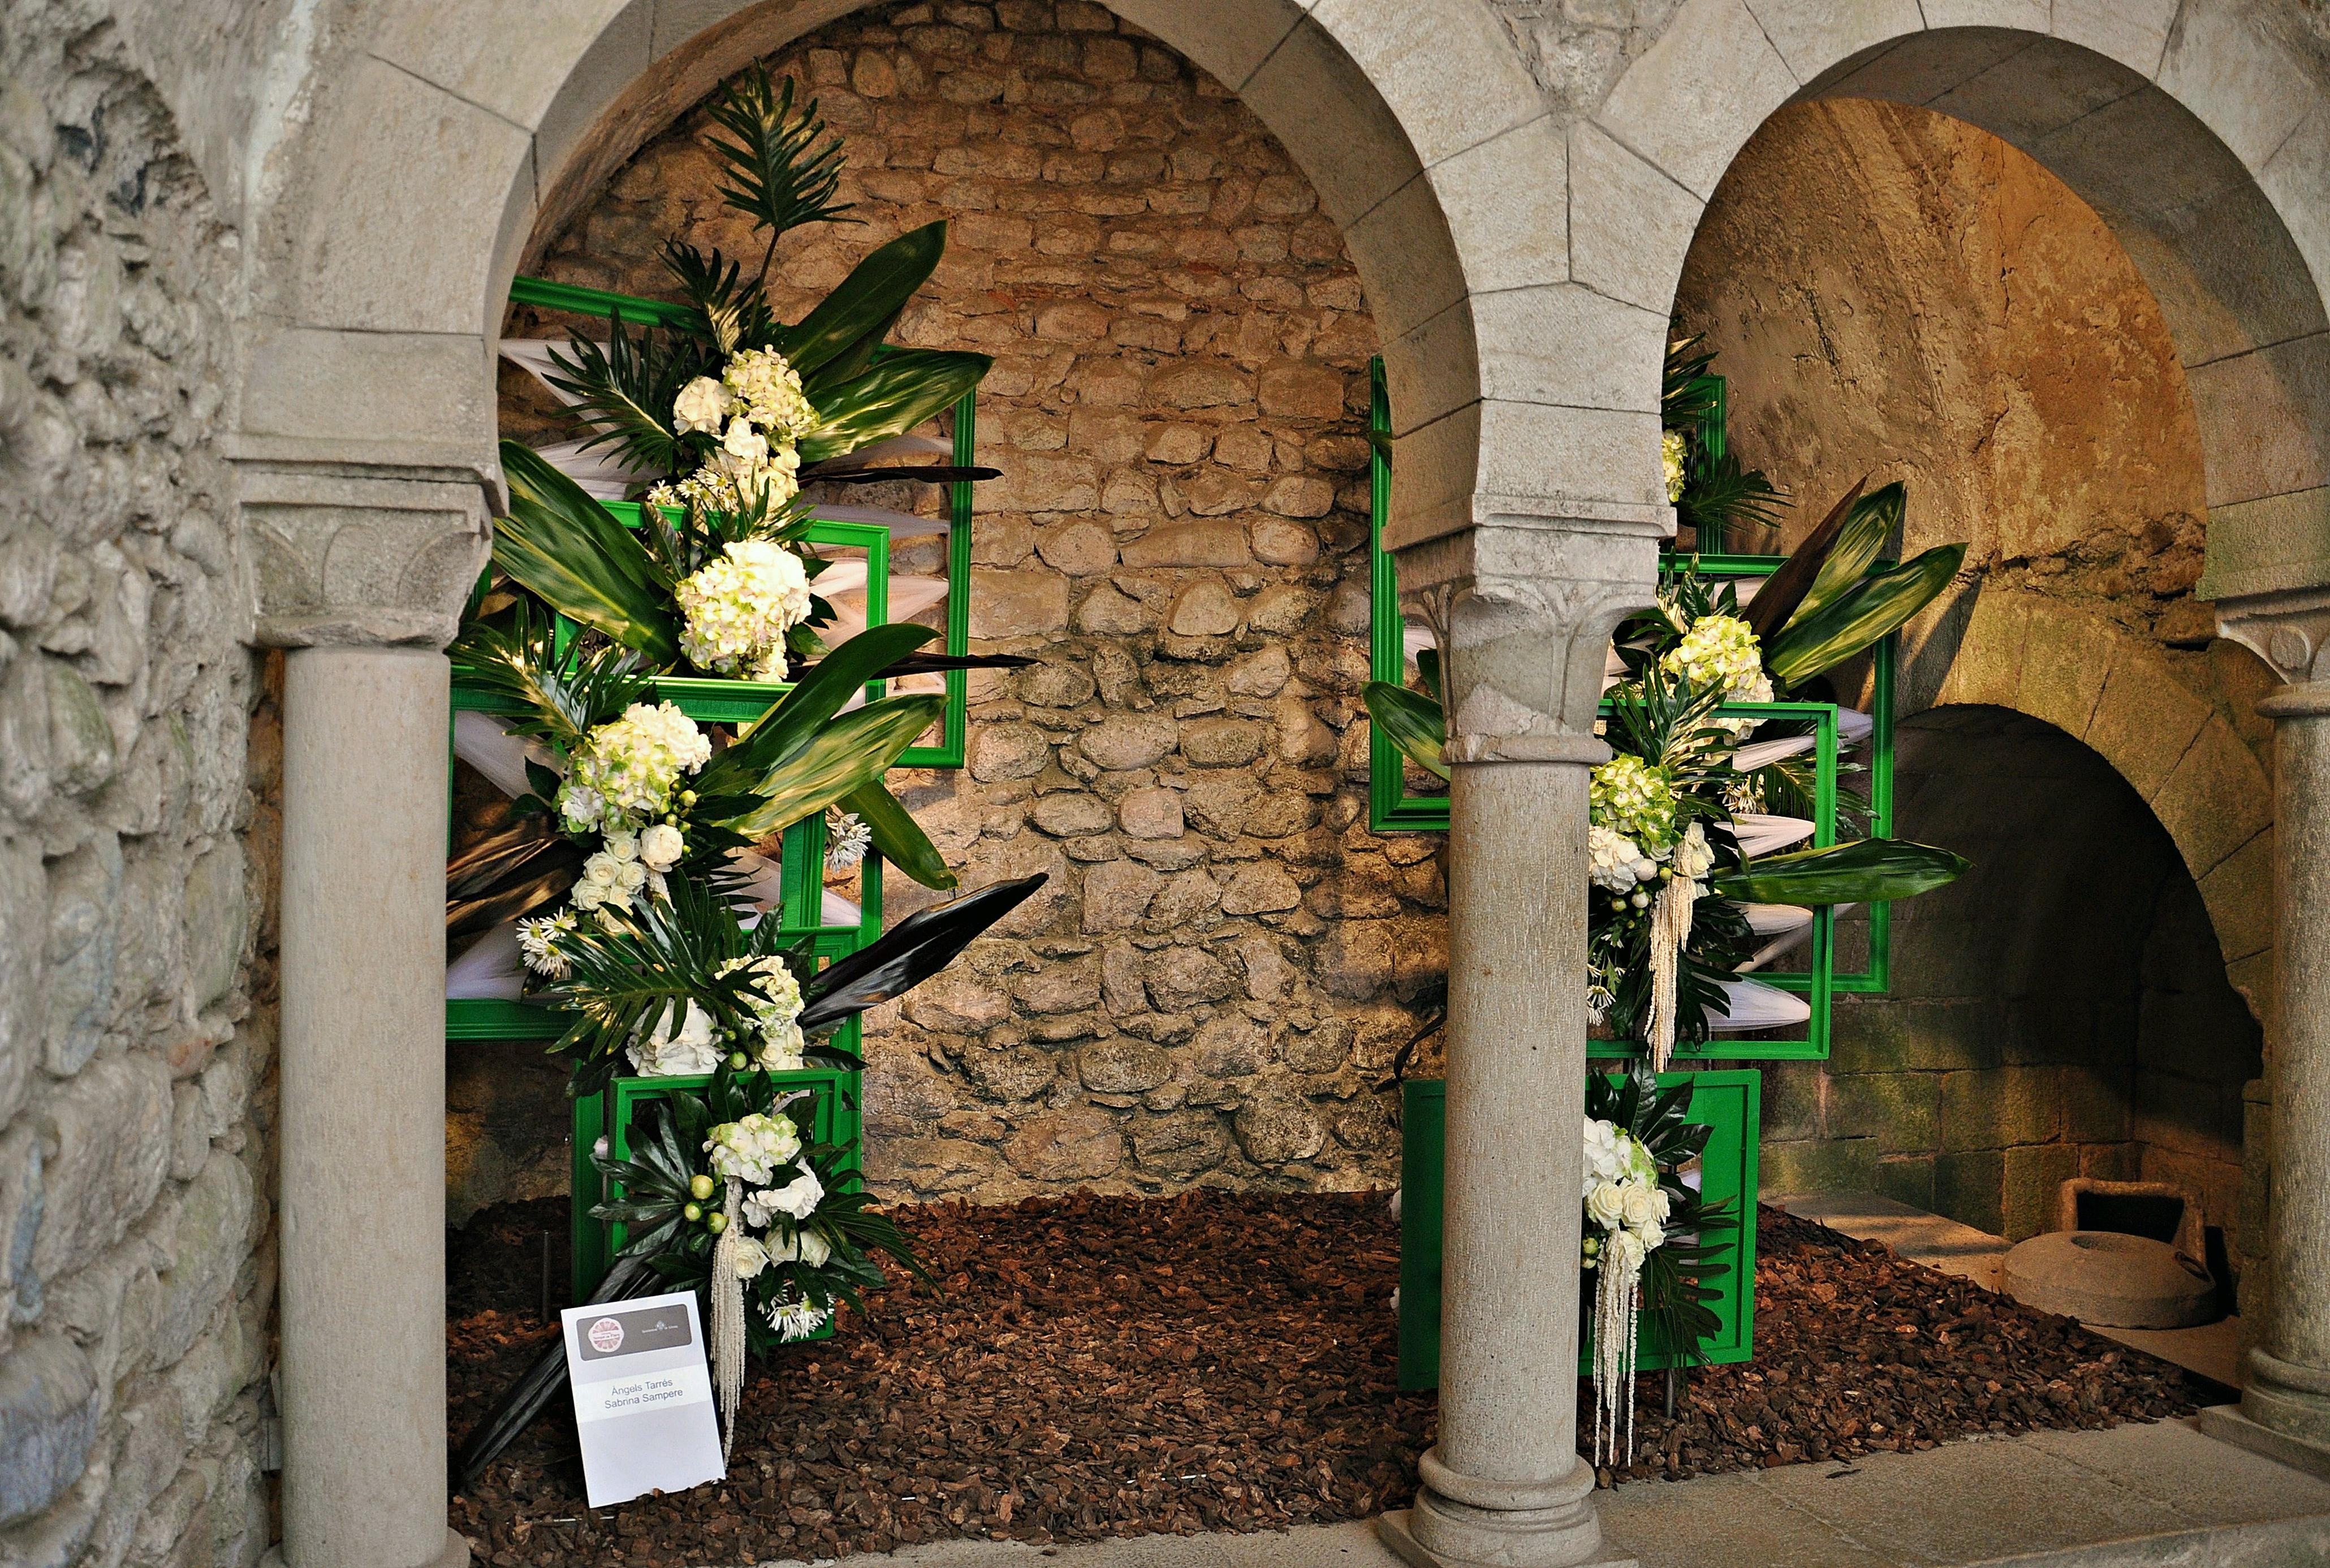 File temps de flors ba os arabes girona 2013 jpg wikimedia commons - Banos arabes de girona ...